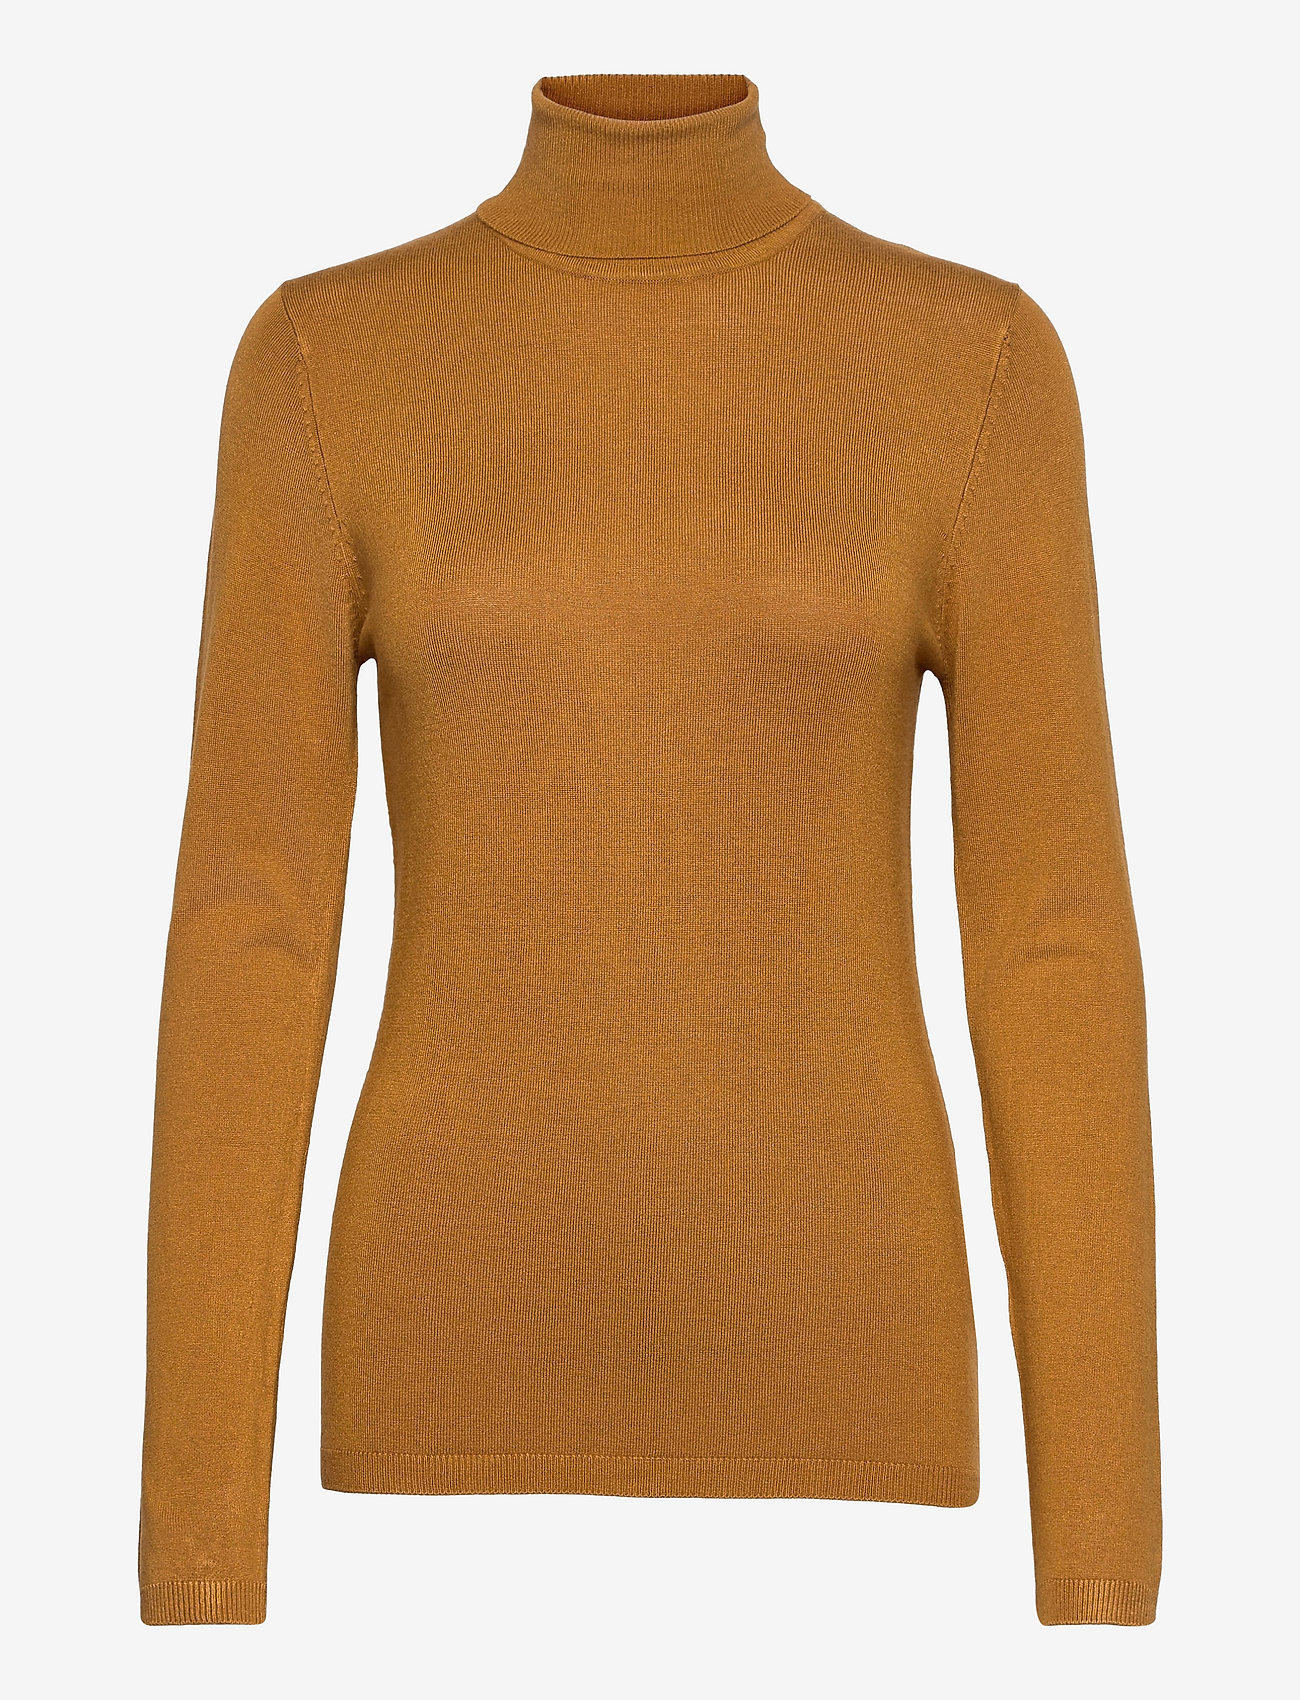 ICHI - IHMAFA RN - džemperi ar augstu apkakli - golden brown - 0